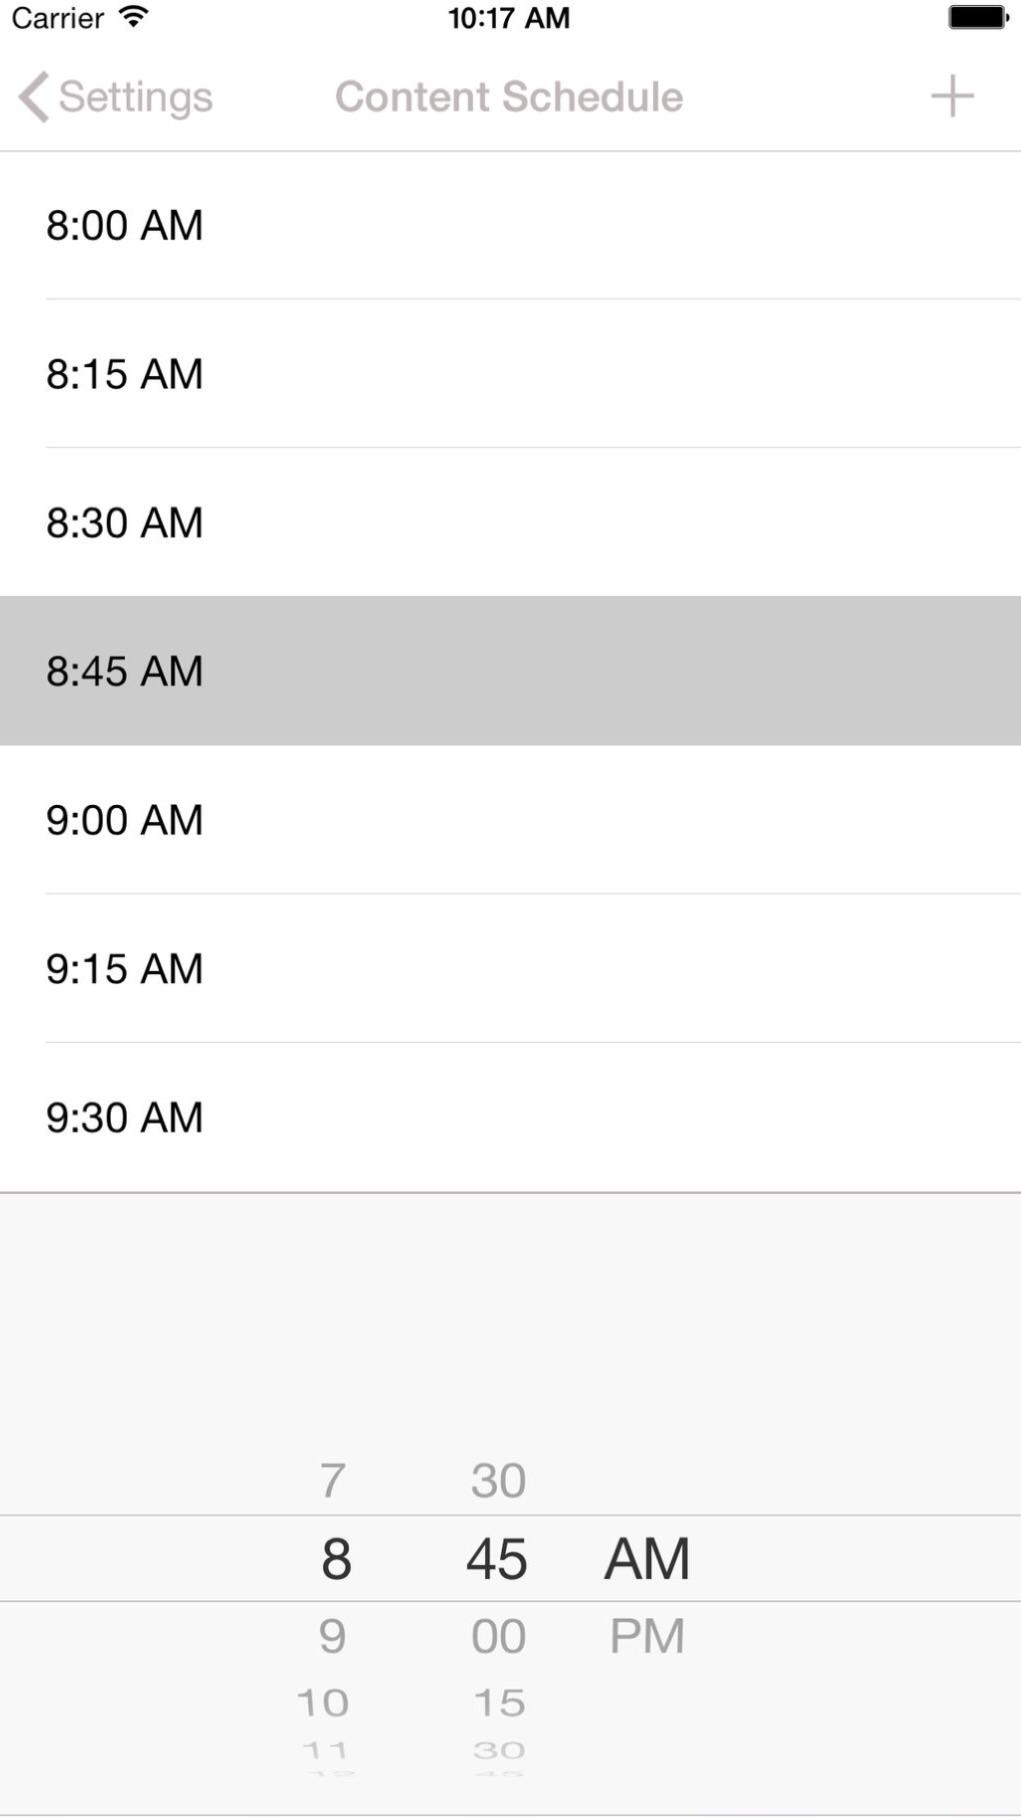 Customizable Content Scheduler